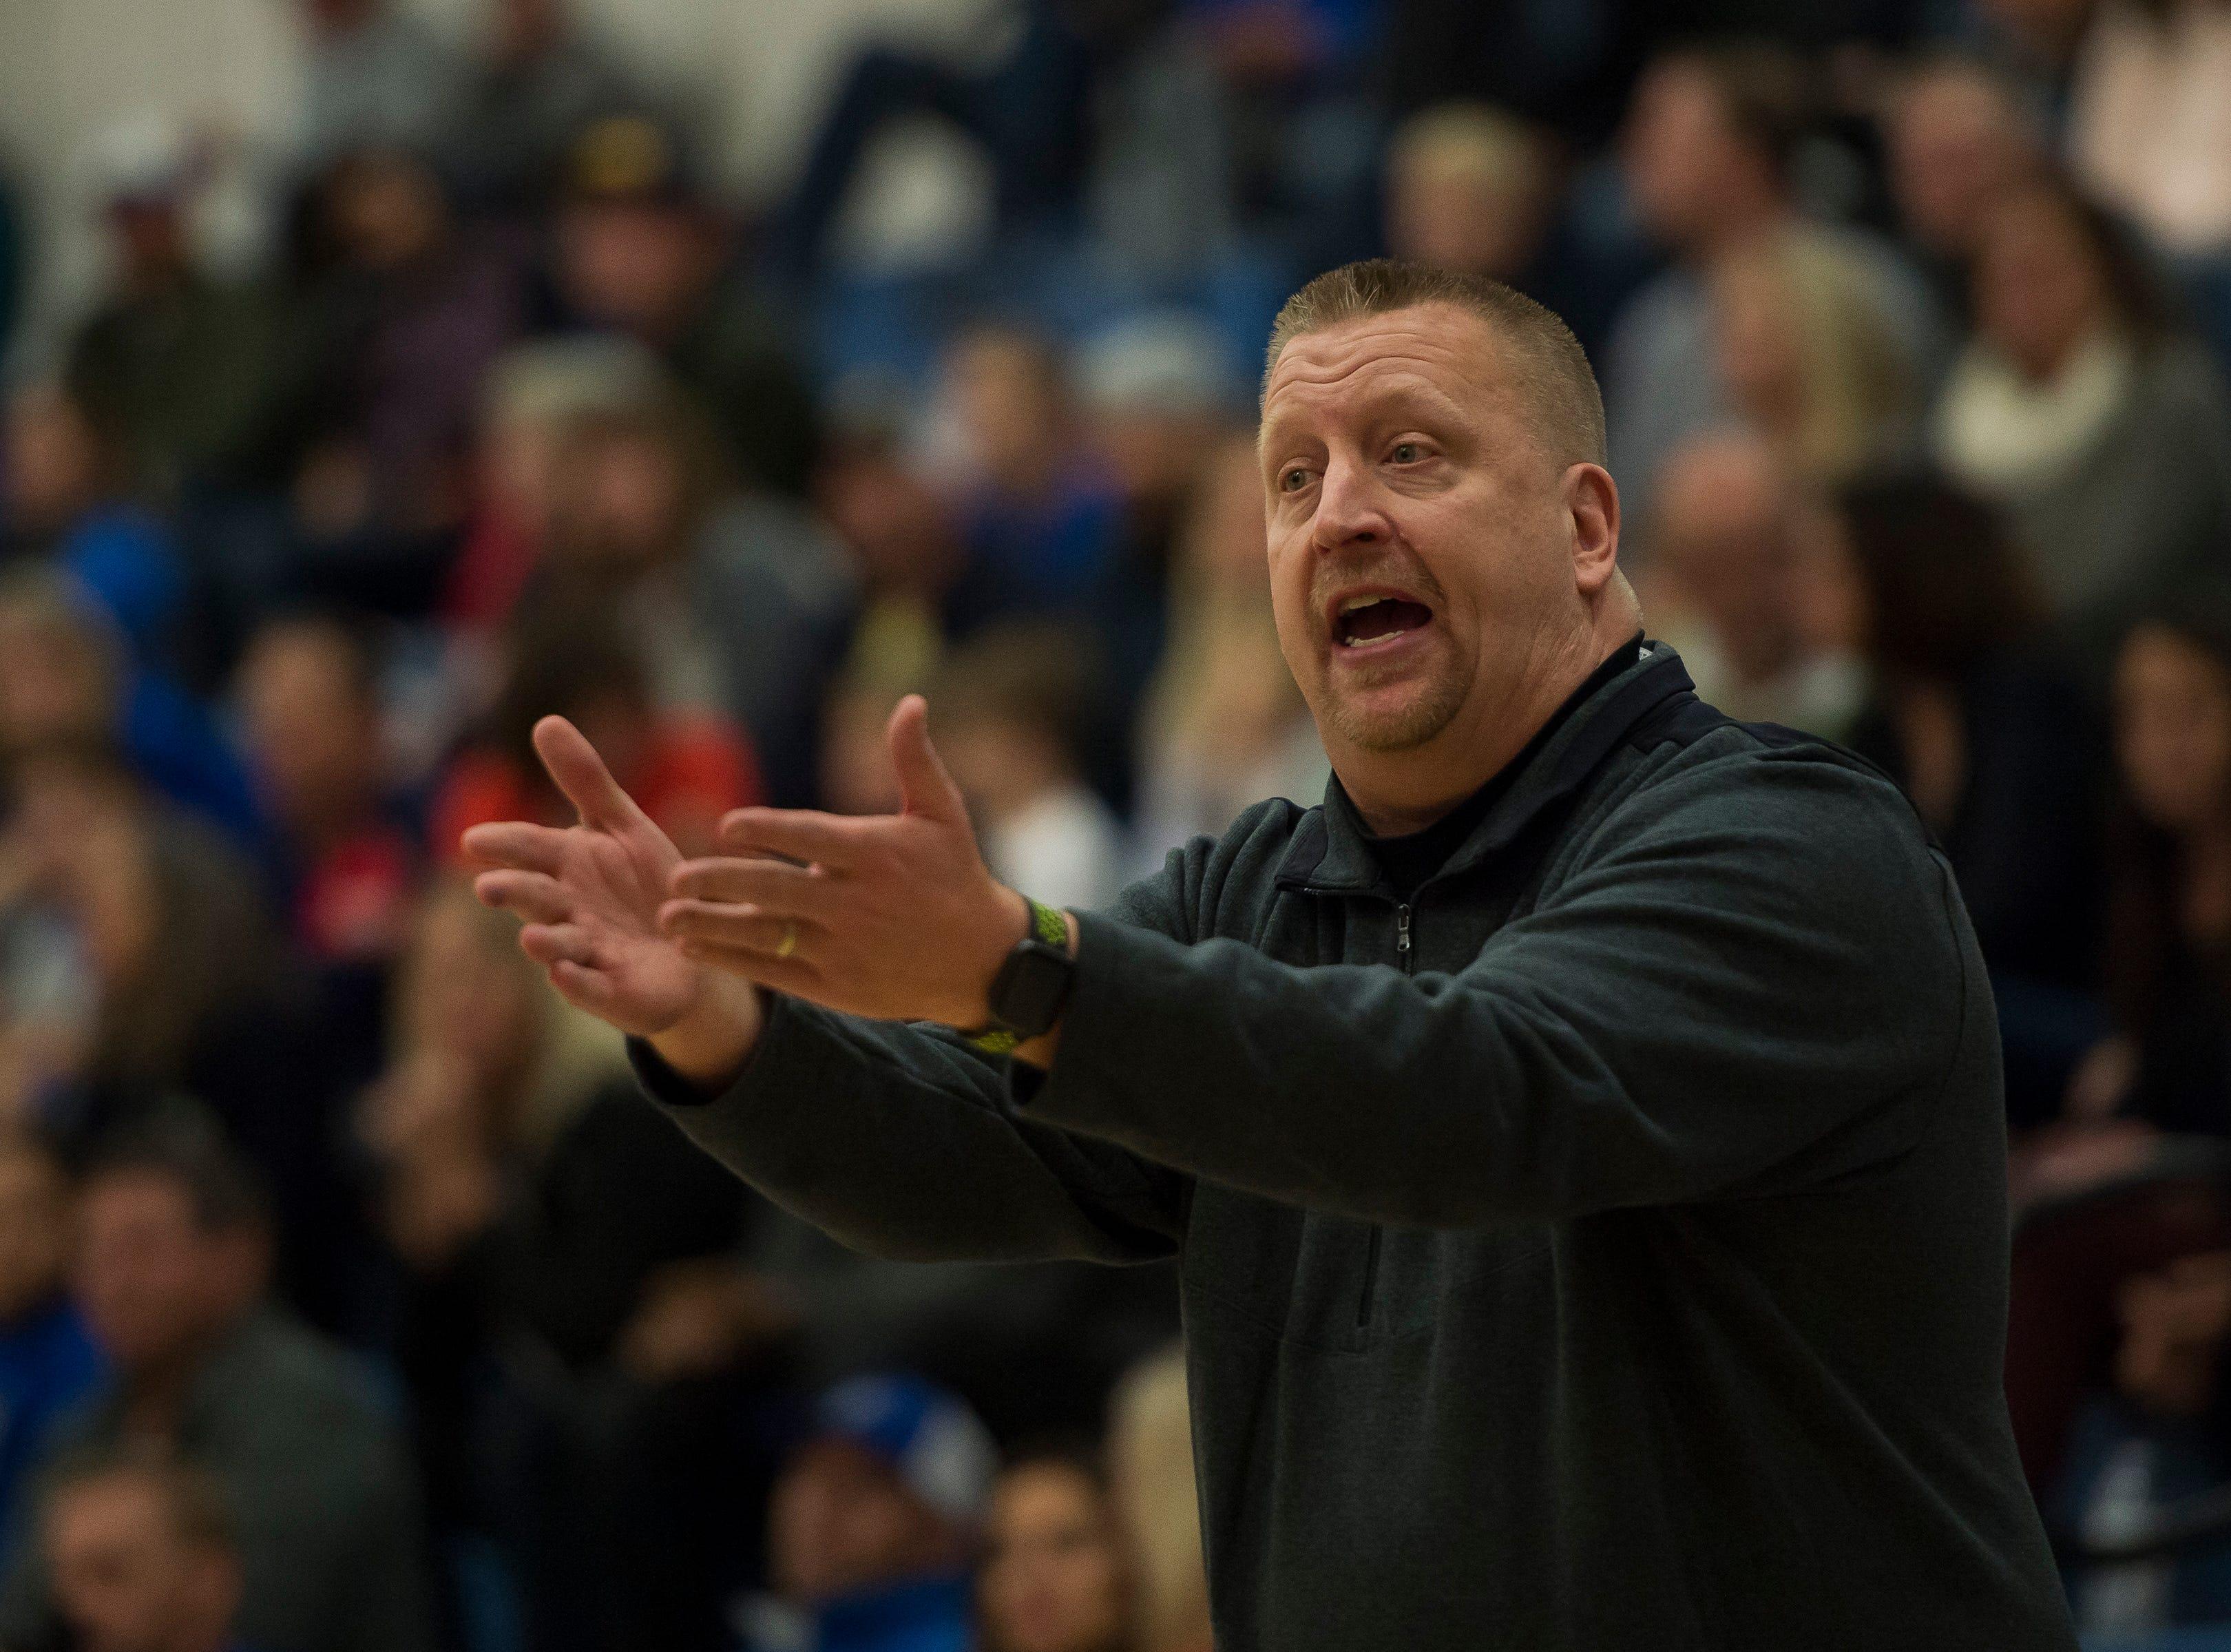 Fossil Ridge High School head coach Matt Johannsen talks to an official during a game against Poudre High School on Tuesday, Dec. 4, 2018, at Poudre High School on Fort Collins, Colo.